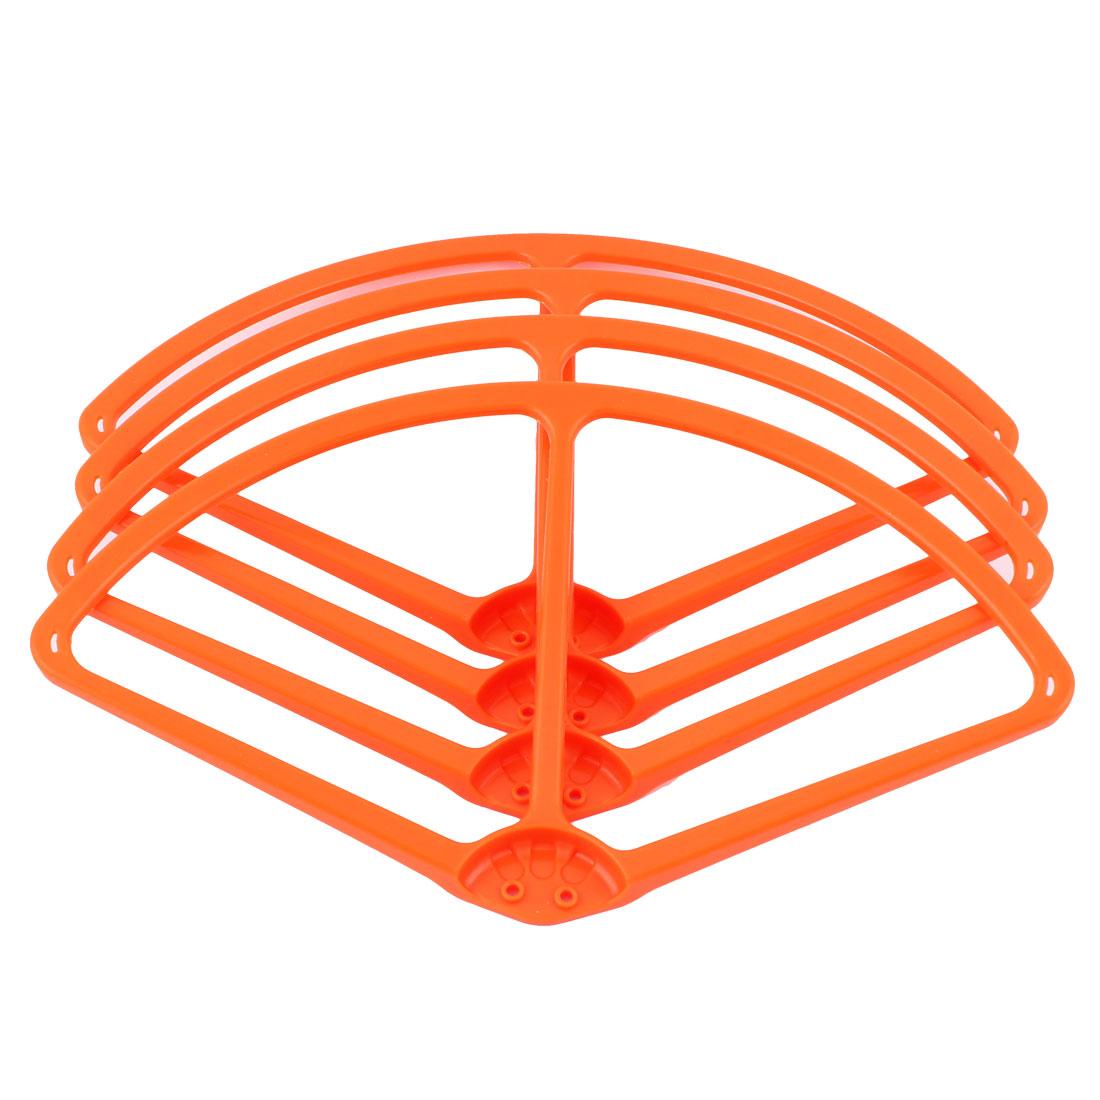 "9"" Prop Protective Protector Guard Bumper Set Orange for DJI Phantom 2 Vision"